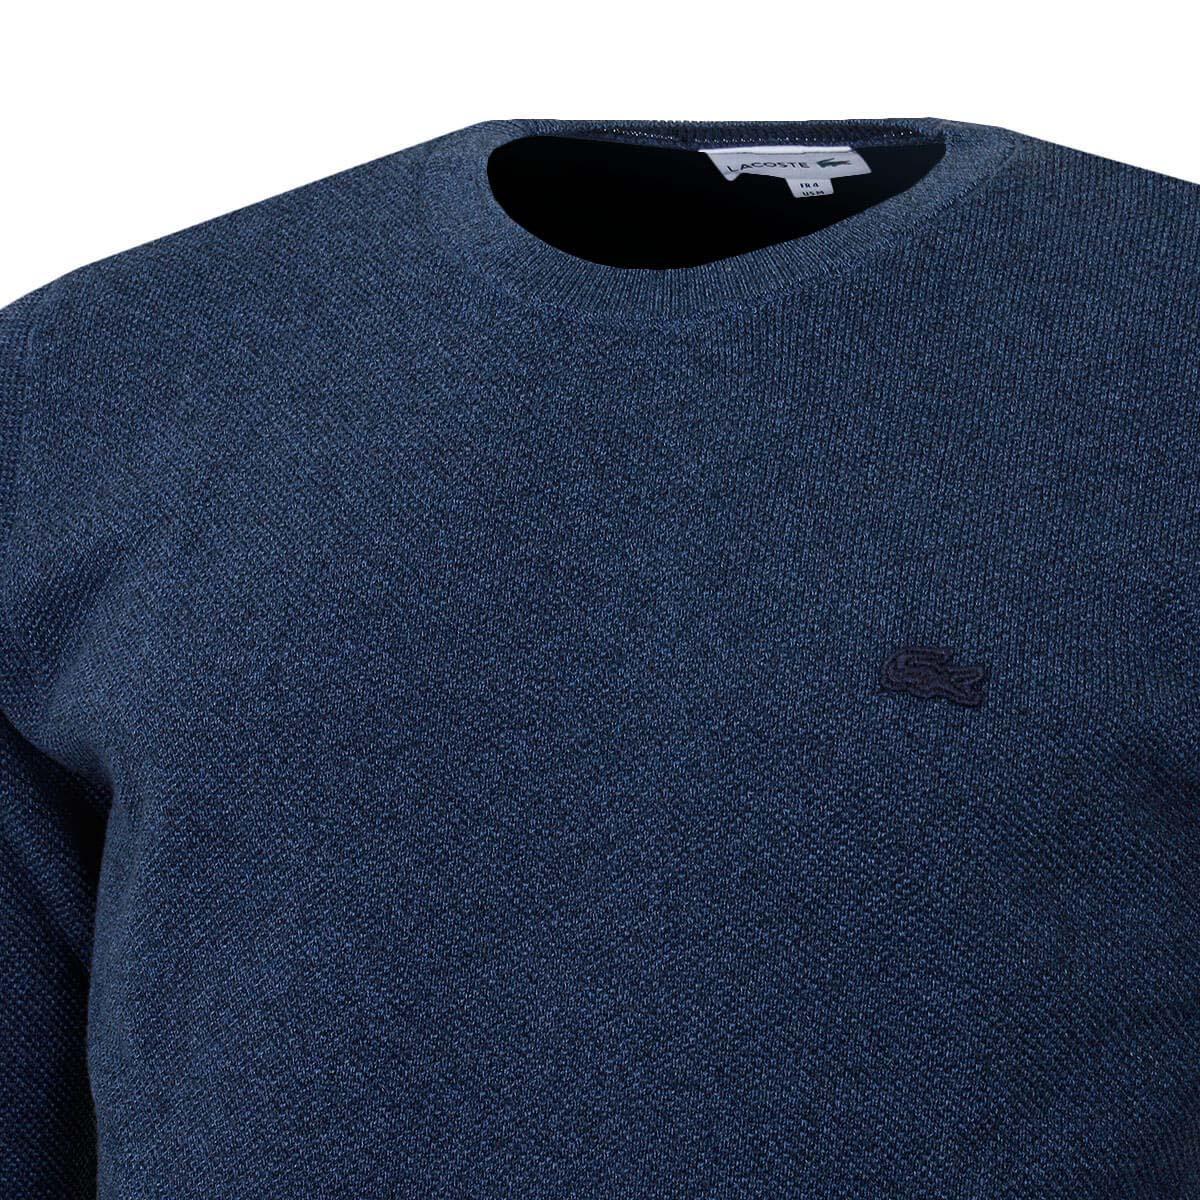 Lacoste Mens 2020 Crew Neck Cotton Pique Crocodile Tonal Sweater 26/% OFF RRP